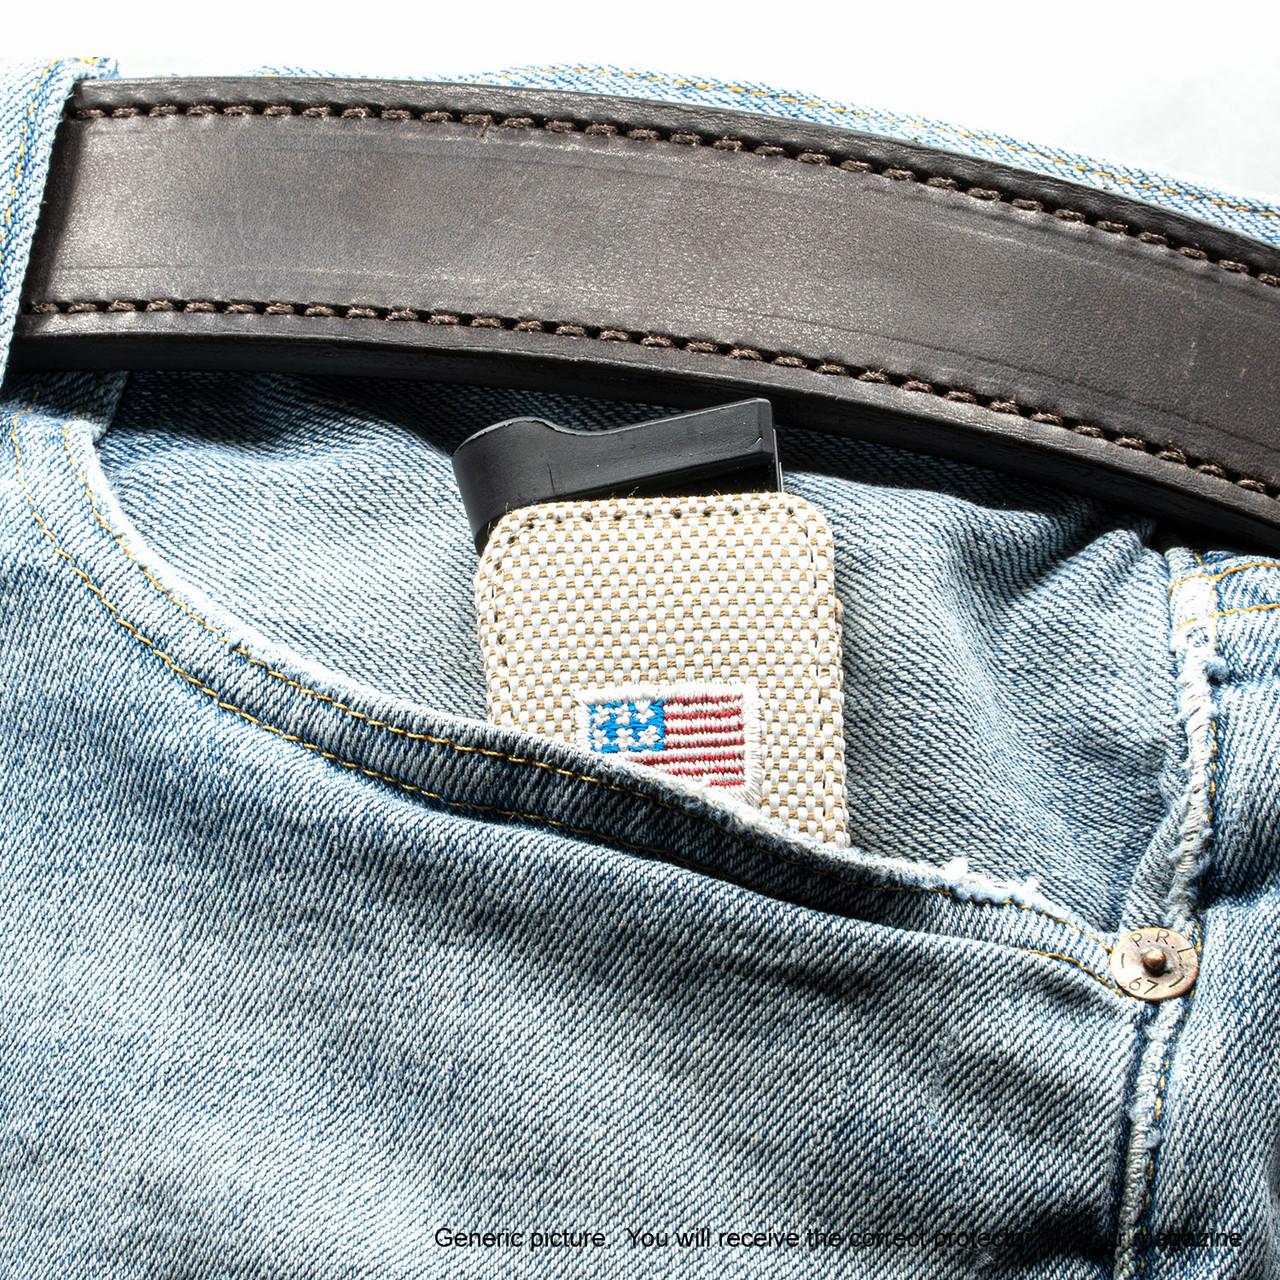 Mossberg MC2c Tan Flag Magazine Pocket Protector